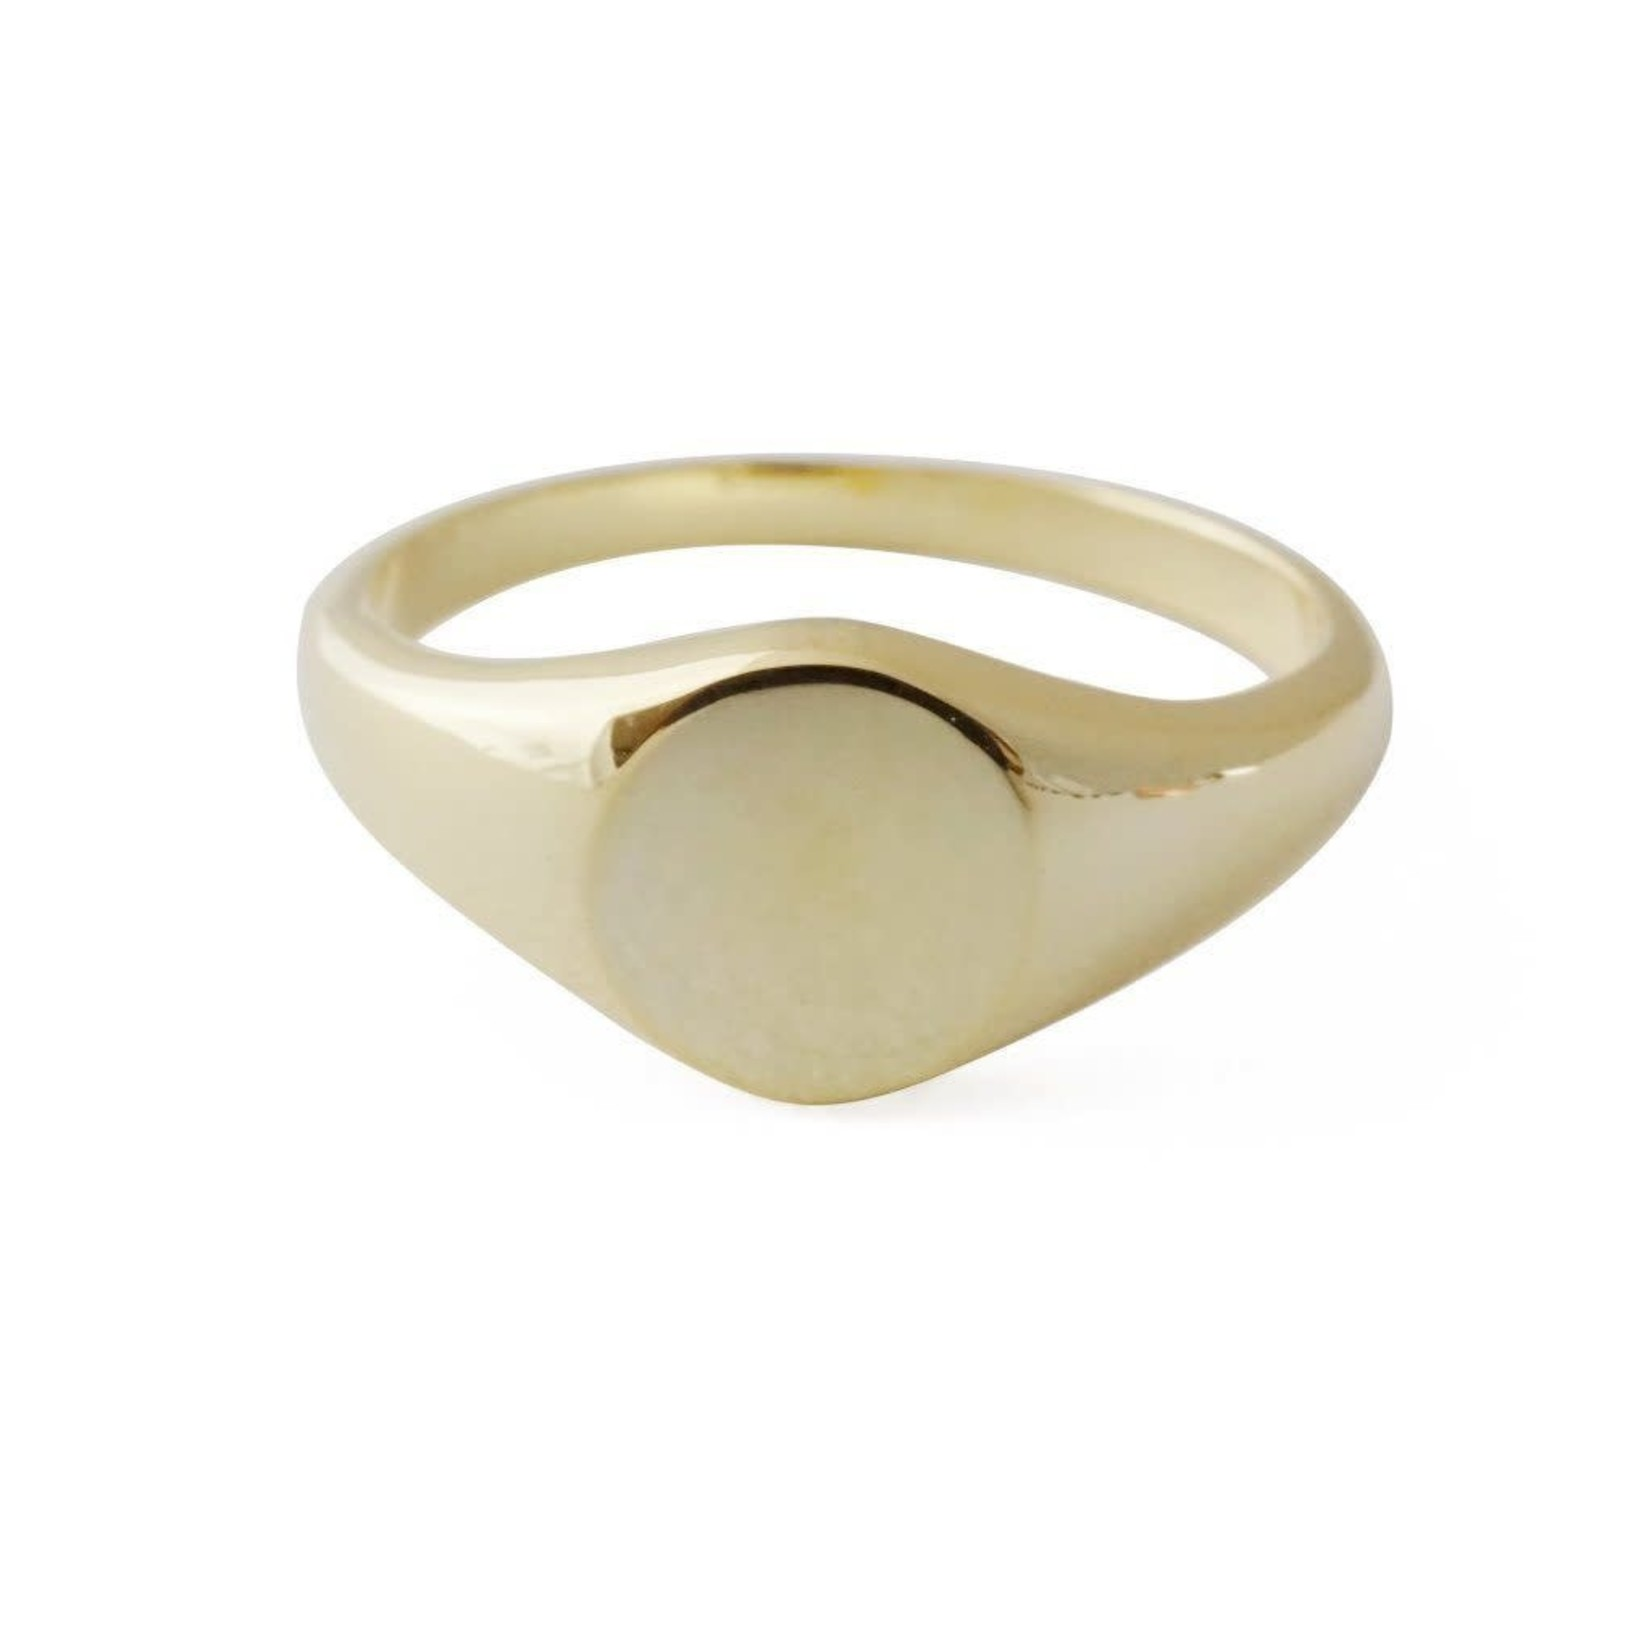 Honeycat Jewelry Honeycat Taylor Signet Ring Gold